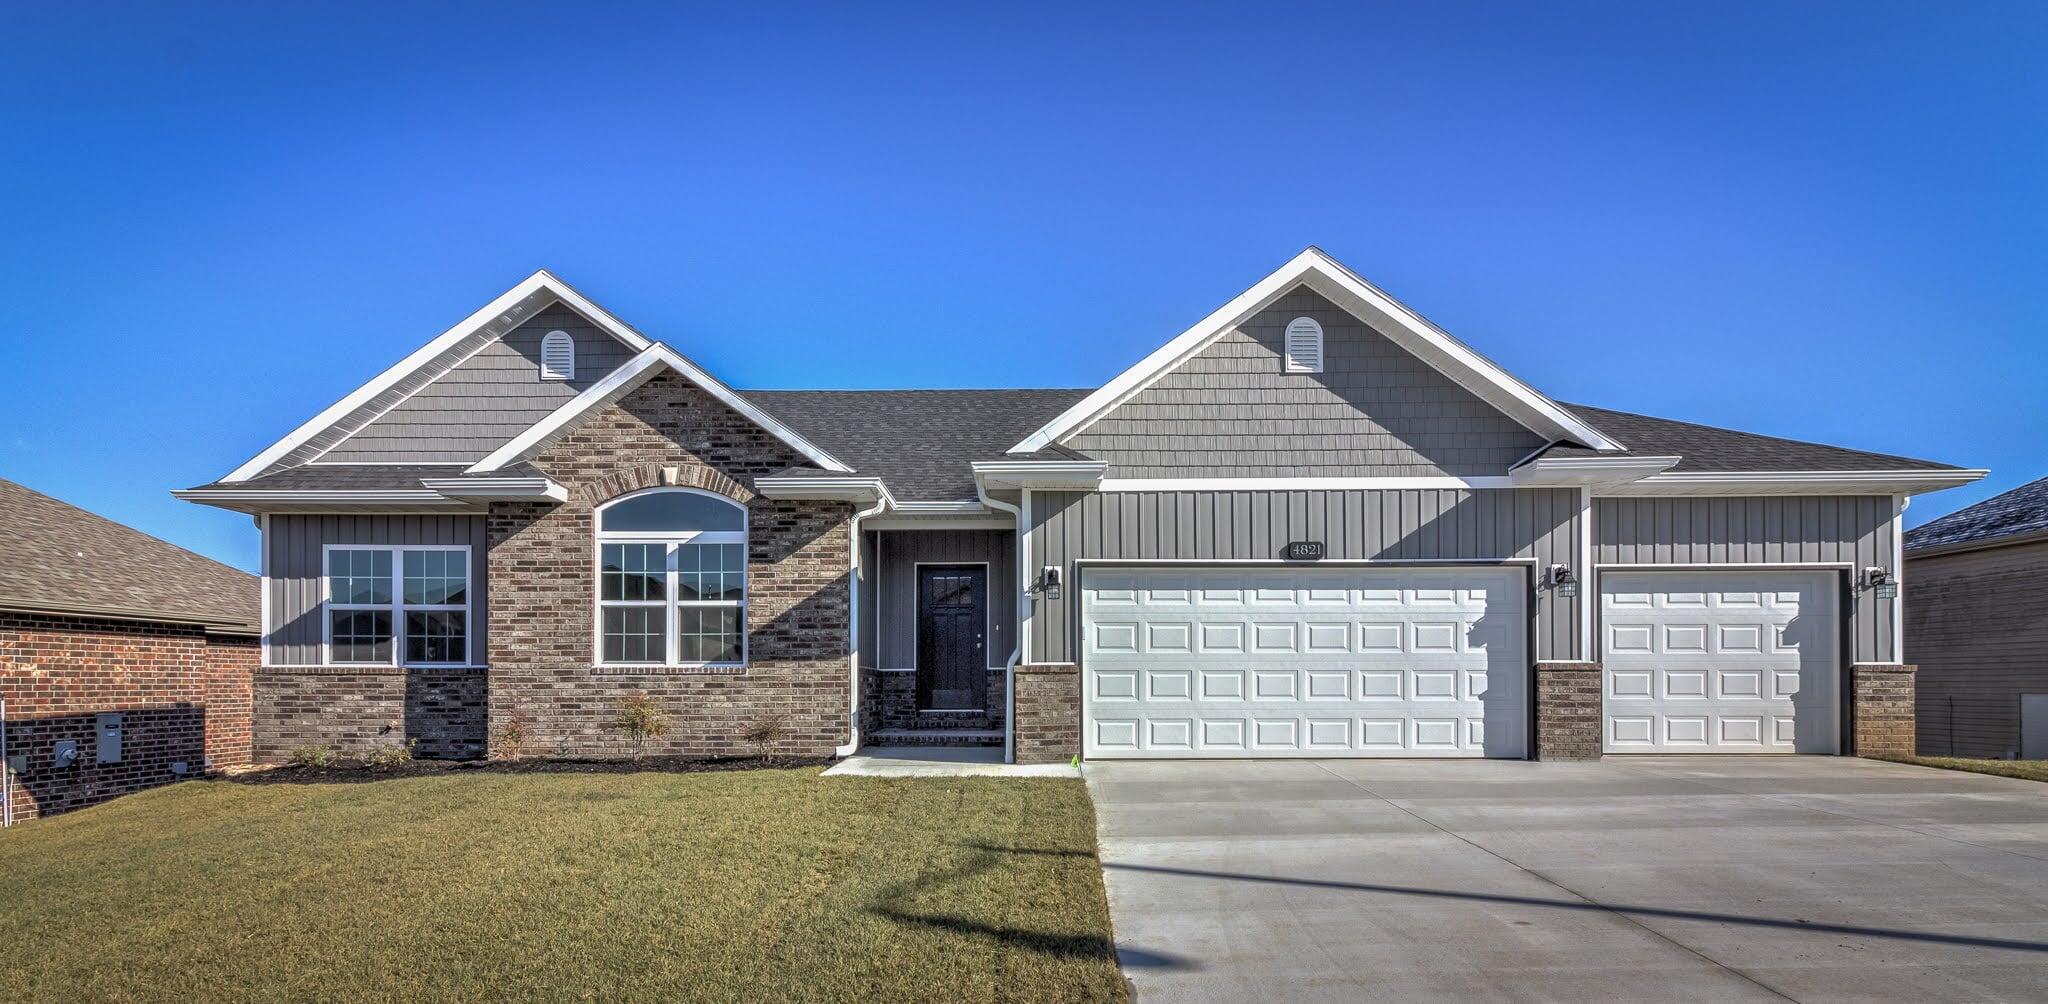 Lot 11 Lakewood Estates 2nd Addition Rogersville, MO 65742